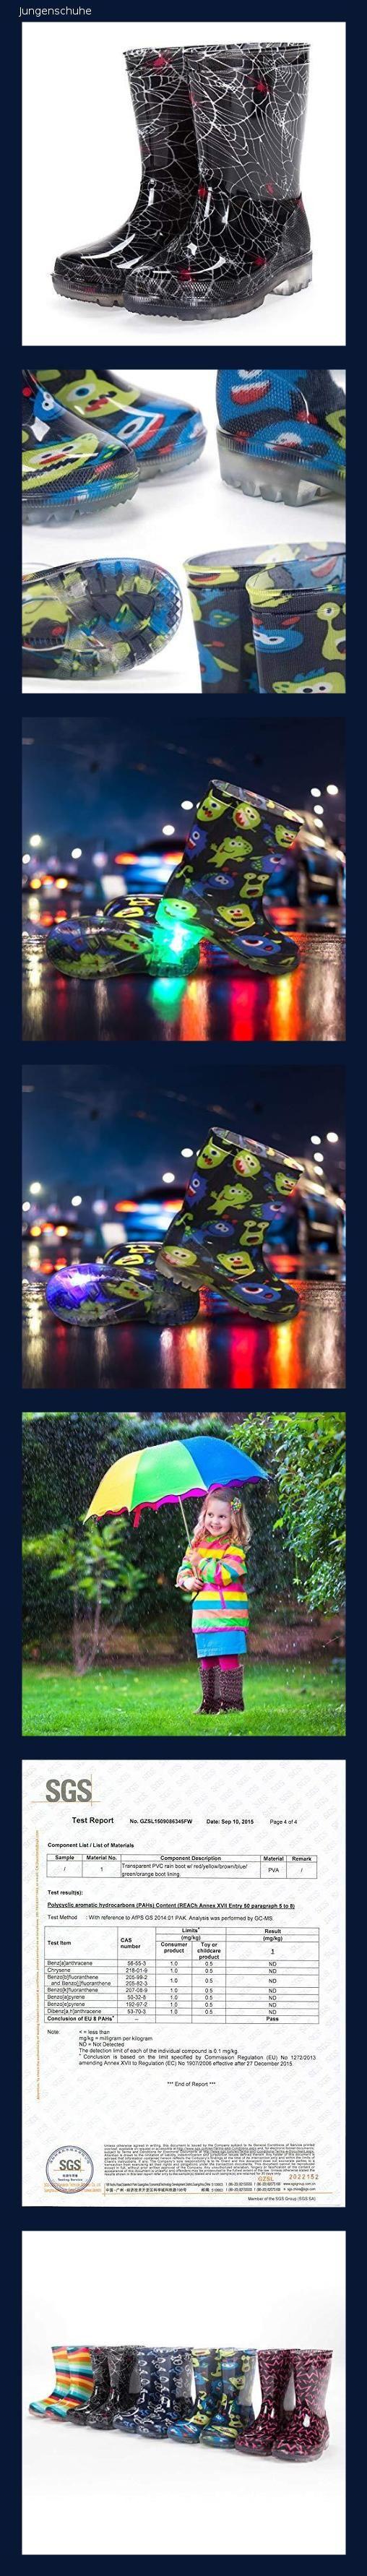 big sale 17c18 2a7b3 diMio Blinkende LED Regenstiefel in Gr. 26-31 für Kinder mit ...